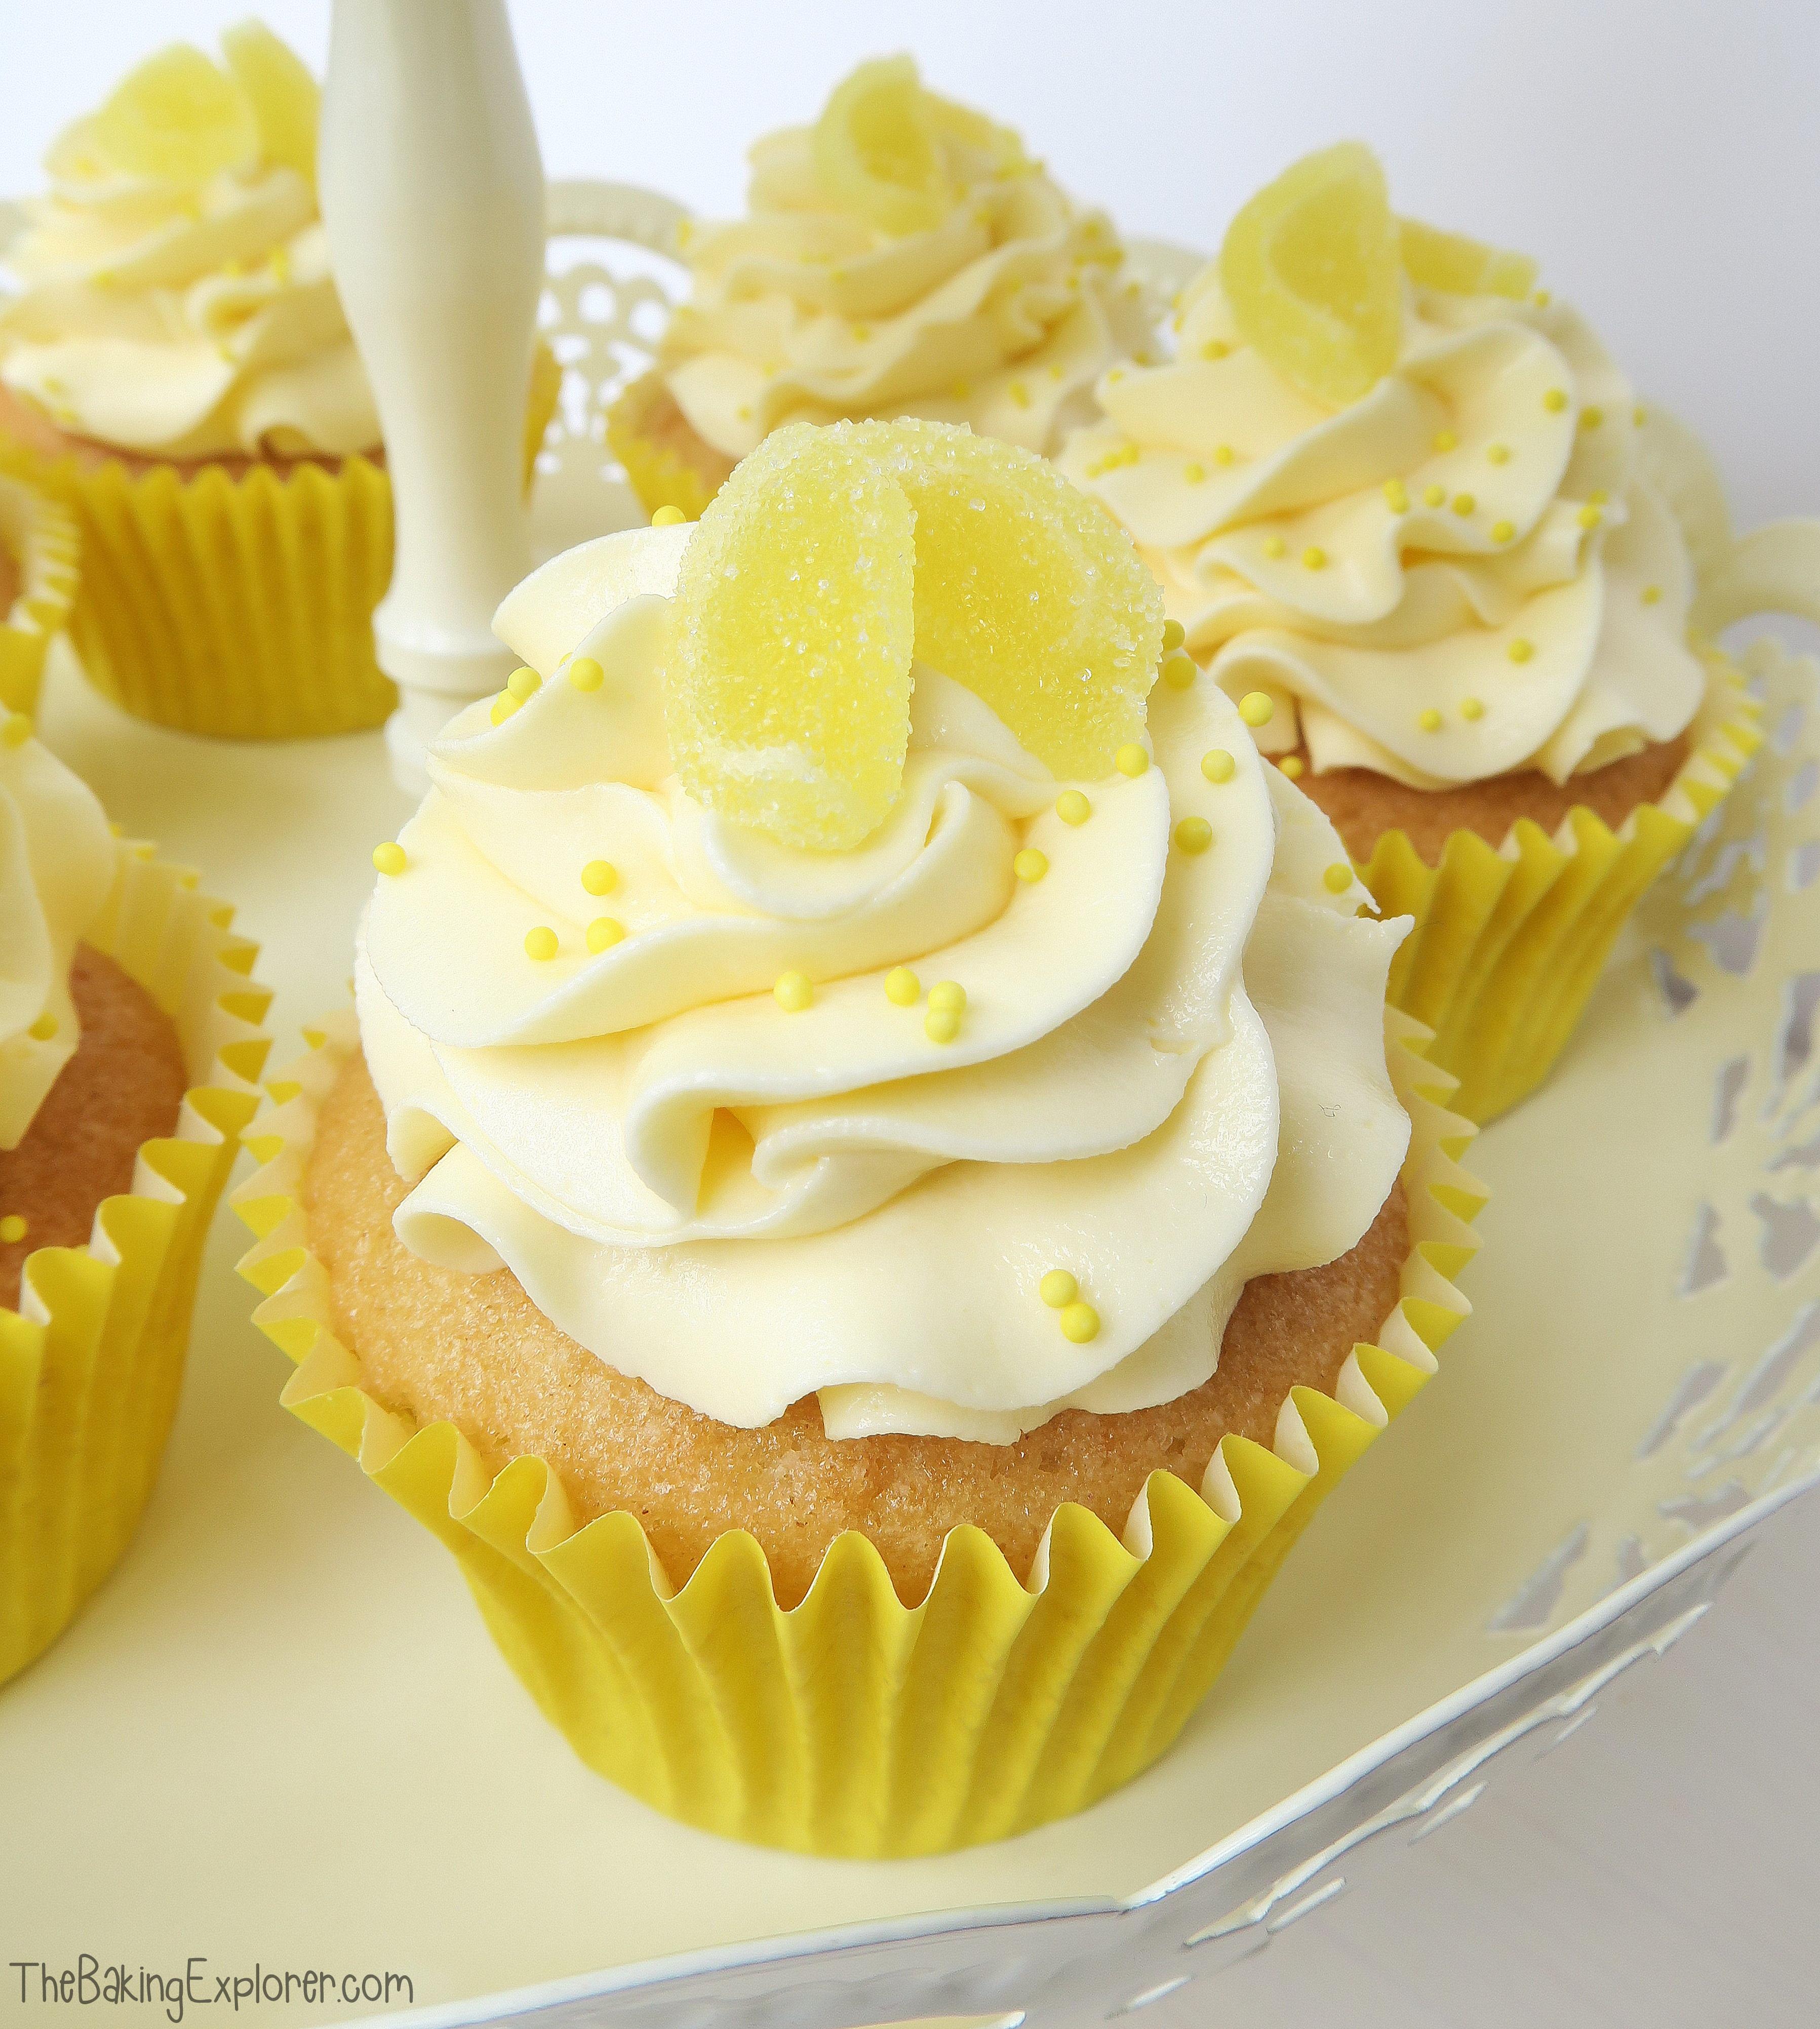 Cupcakes with curd filling. Lemons clipart lemon cupcake